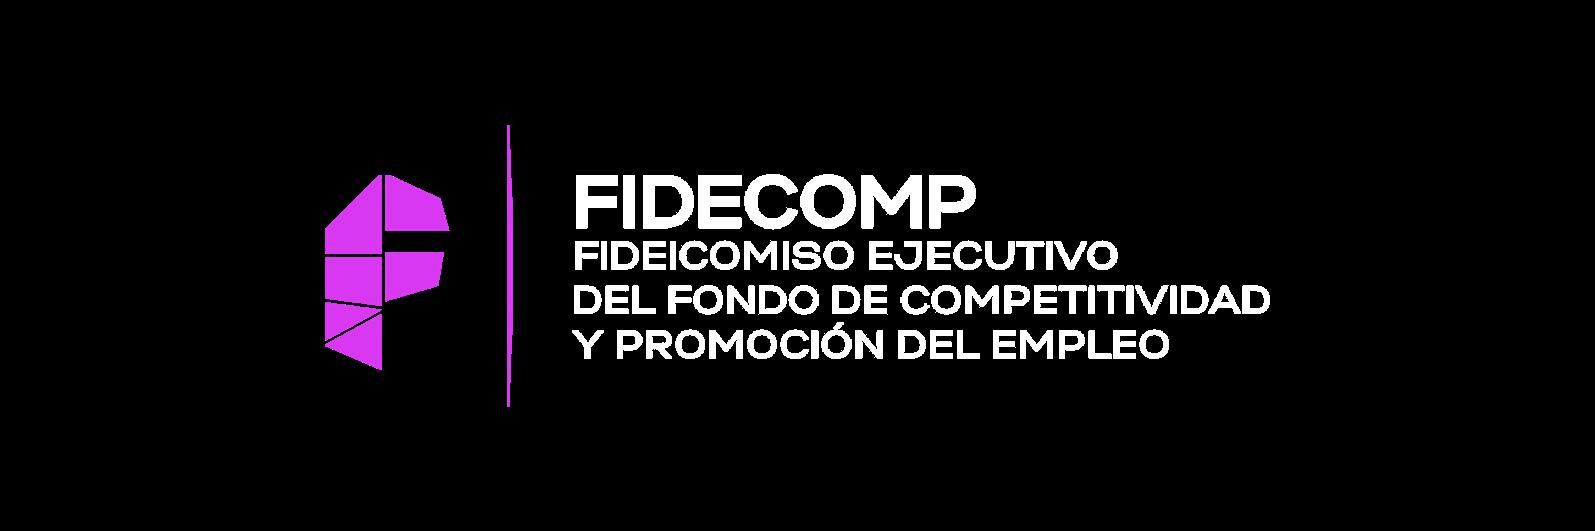 Fidecomp